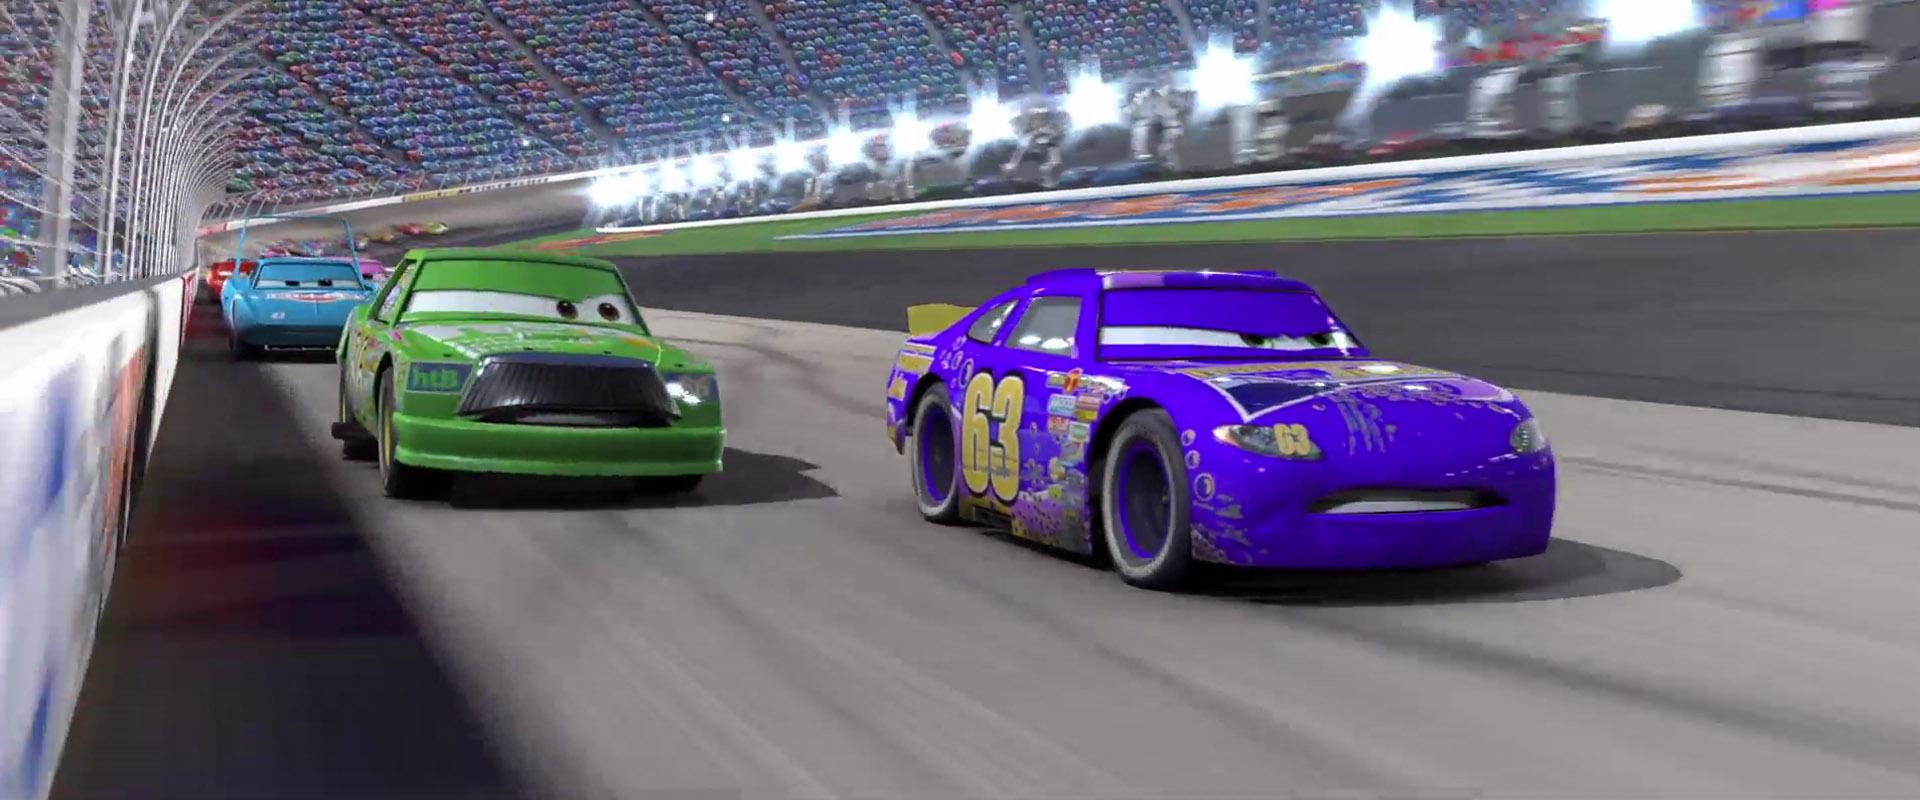 lee revkins personnage character pixar disney cars